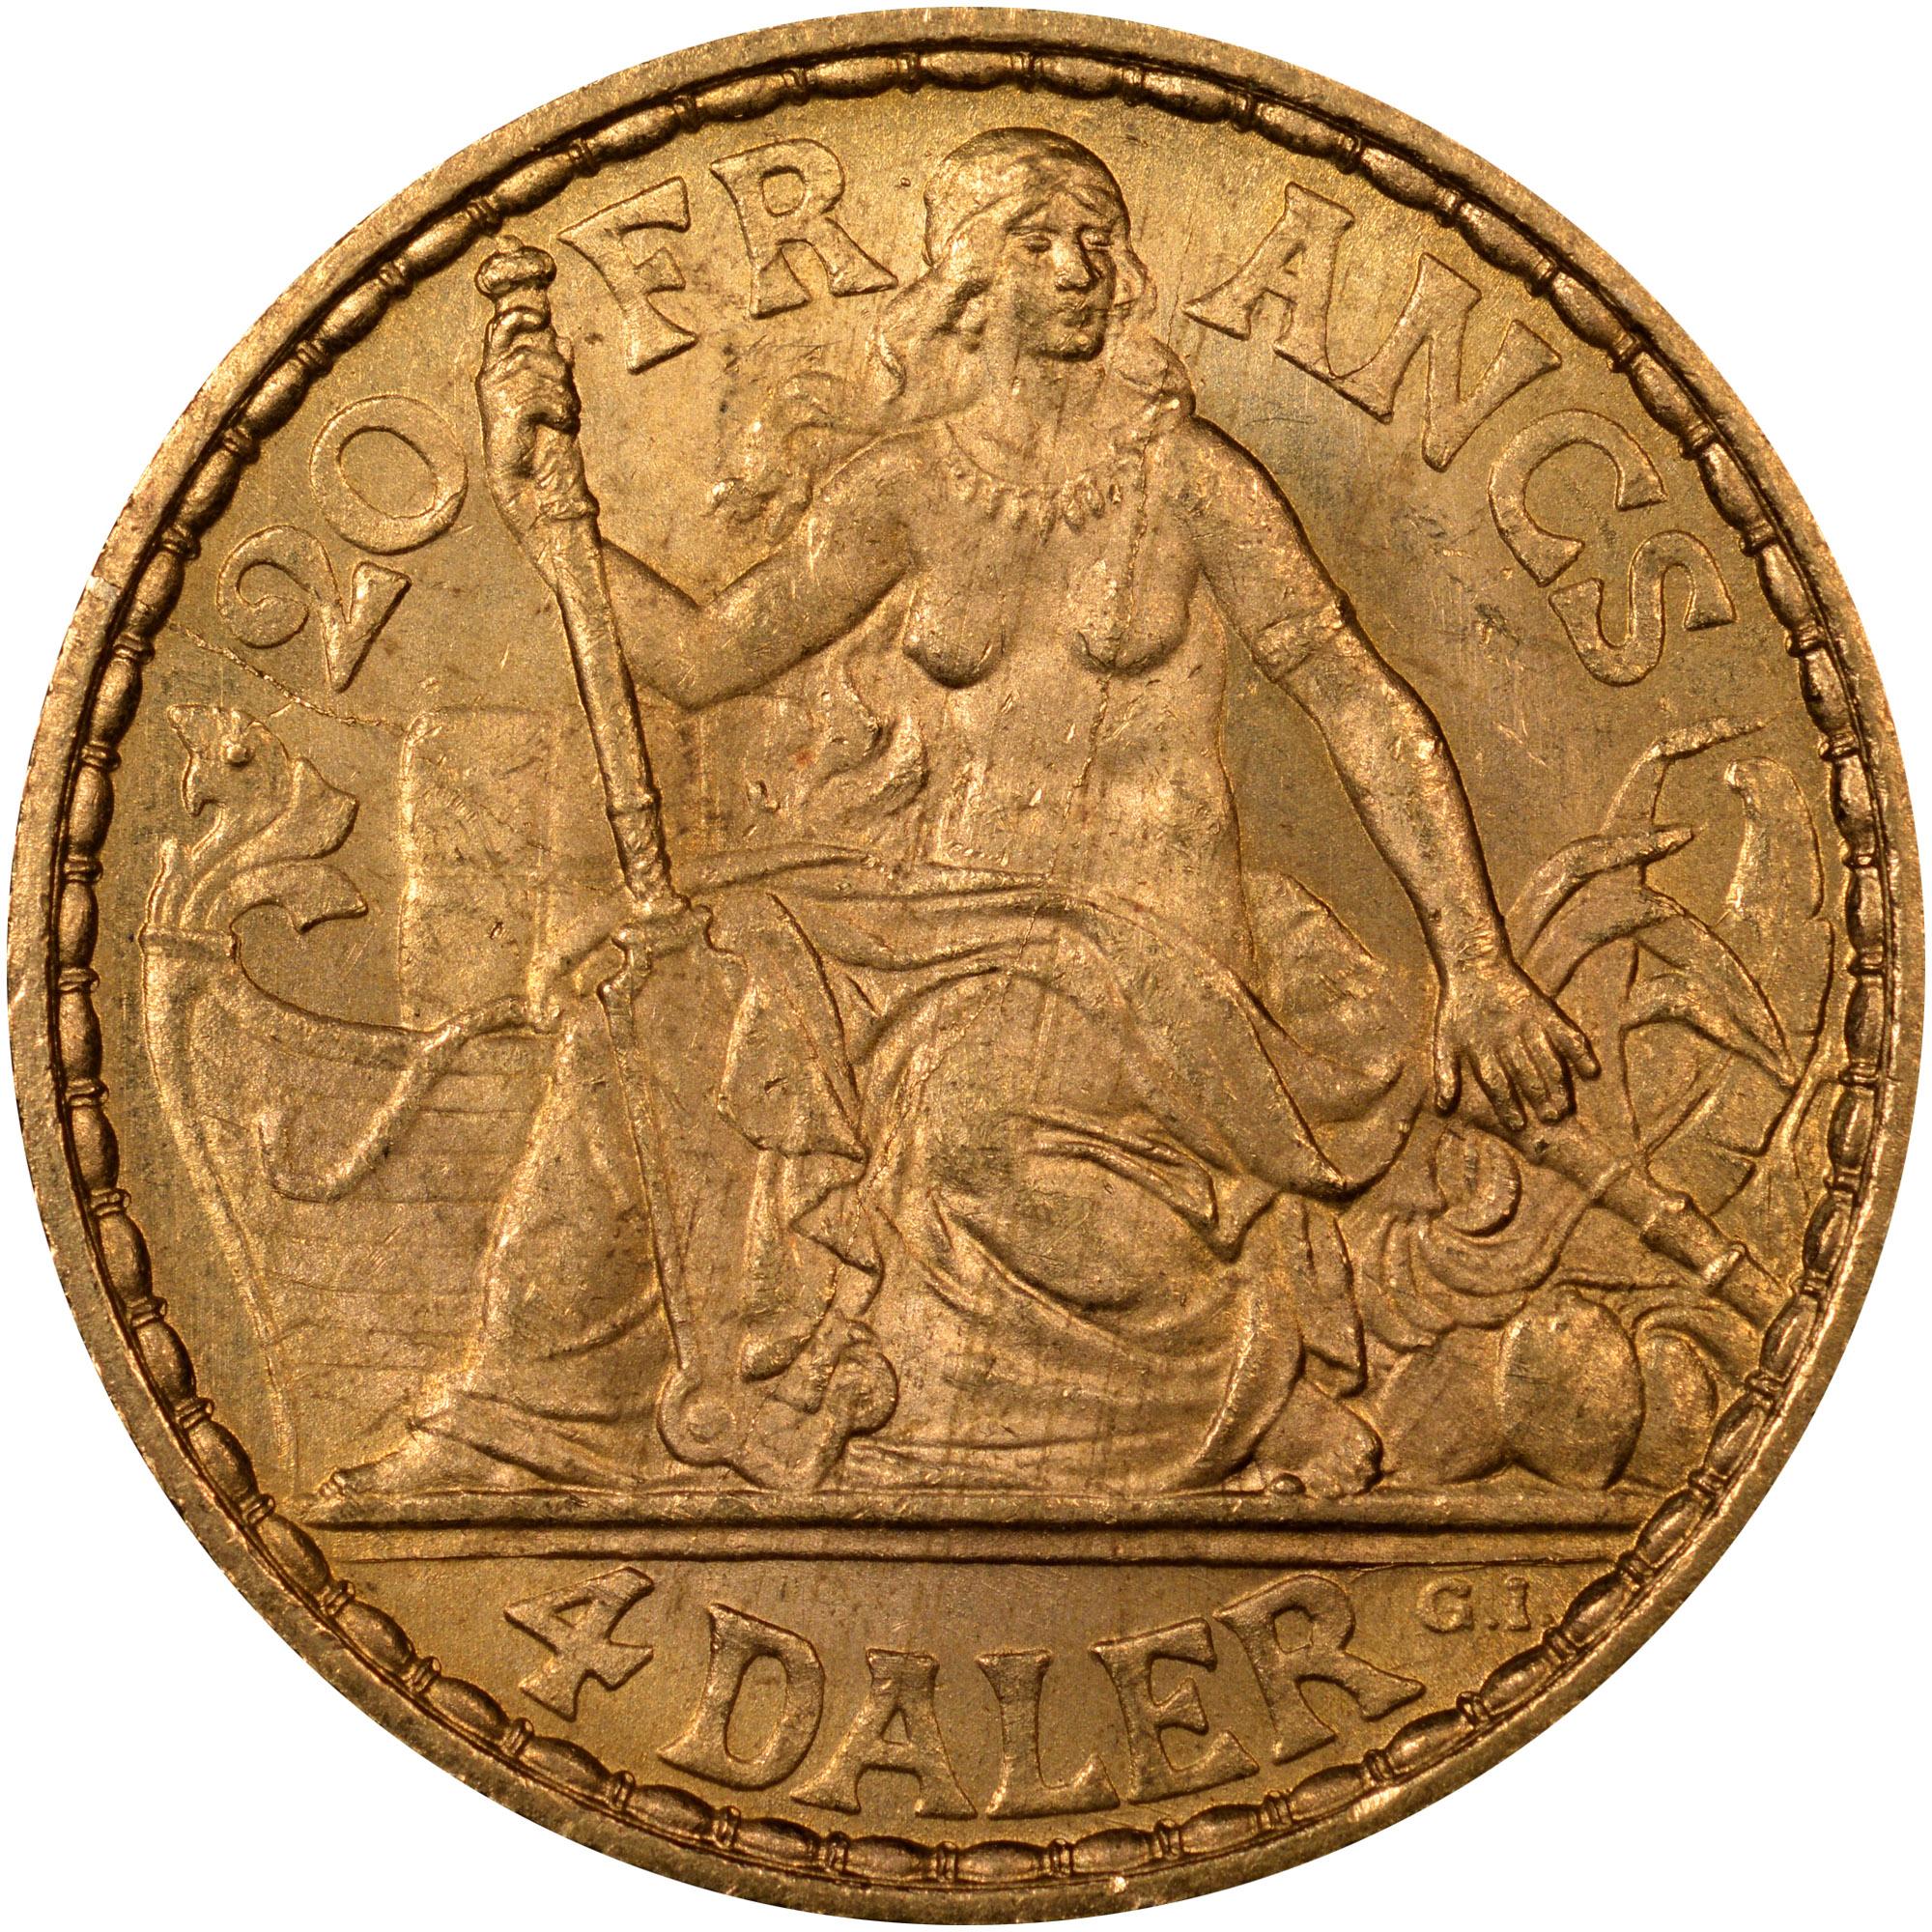 1904-1905 Danish West Indies 4 Daler, 20 Francs reverse